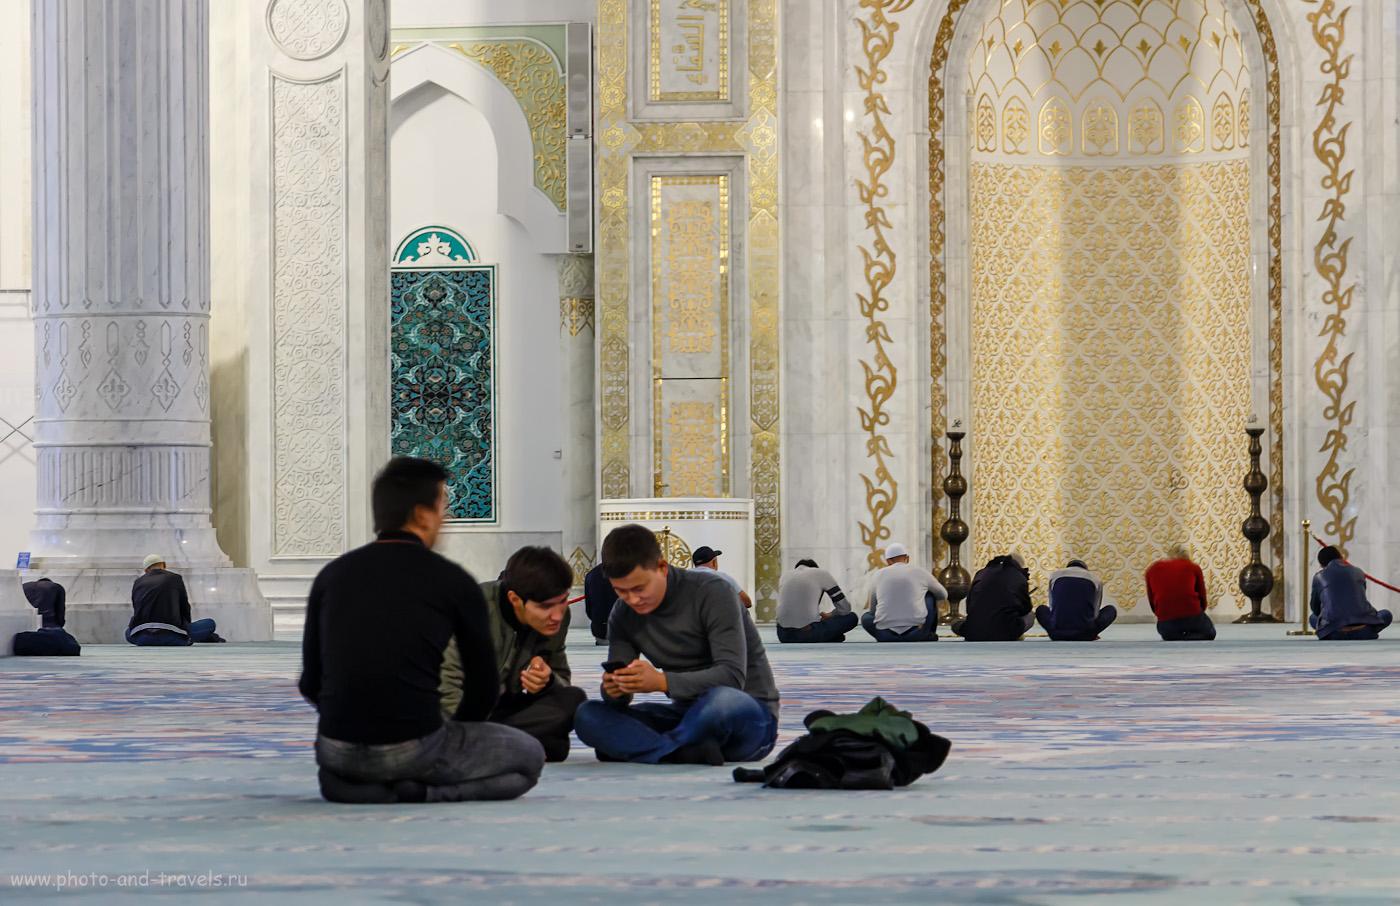 Фотография 28. В ожидании намаза в мечети «Хазрет Султан». 1/4, -0.3, 5.6, 800, 91.